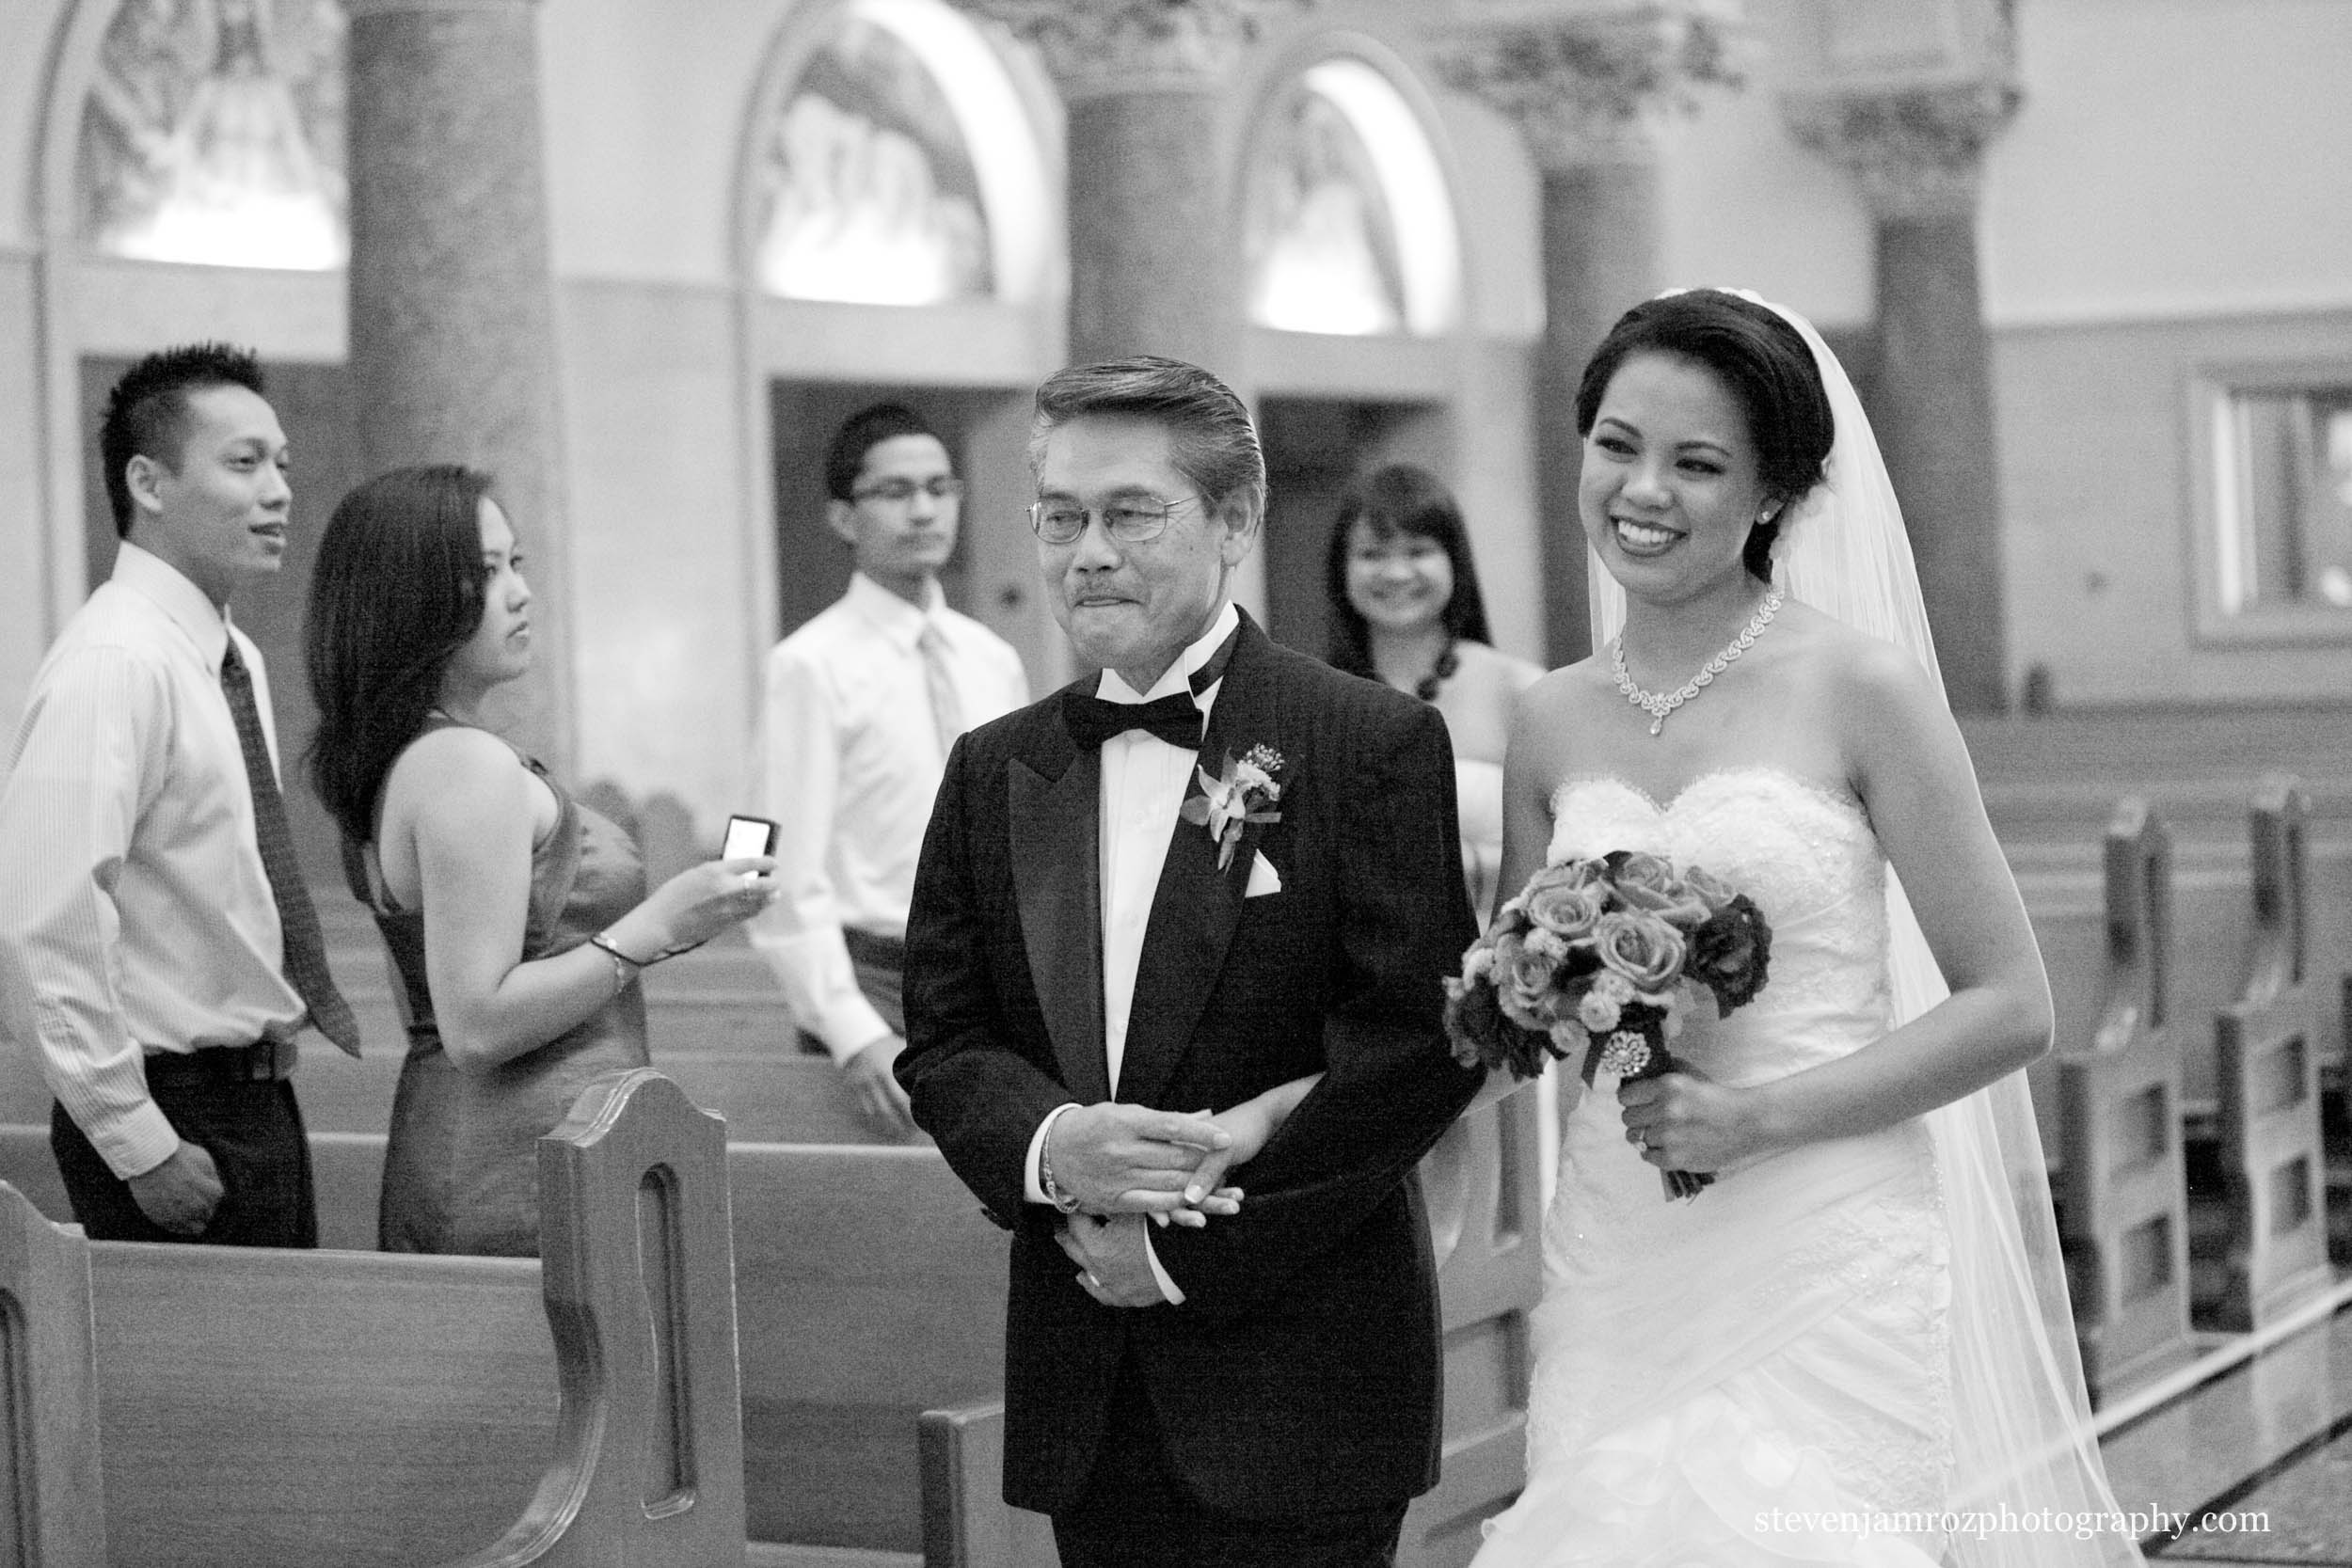 proud-father-walks-bride-down-aisle-wedding-raleigh-steven-jamroz-0725.jpg